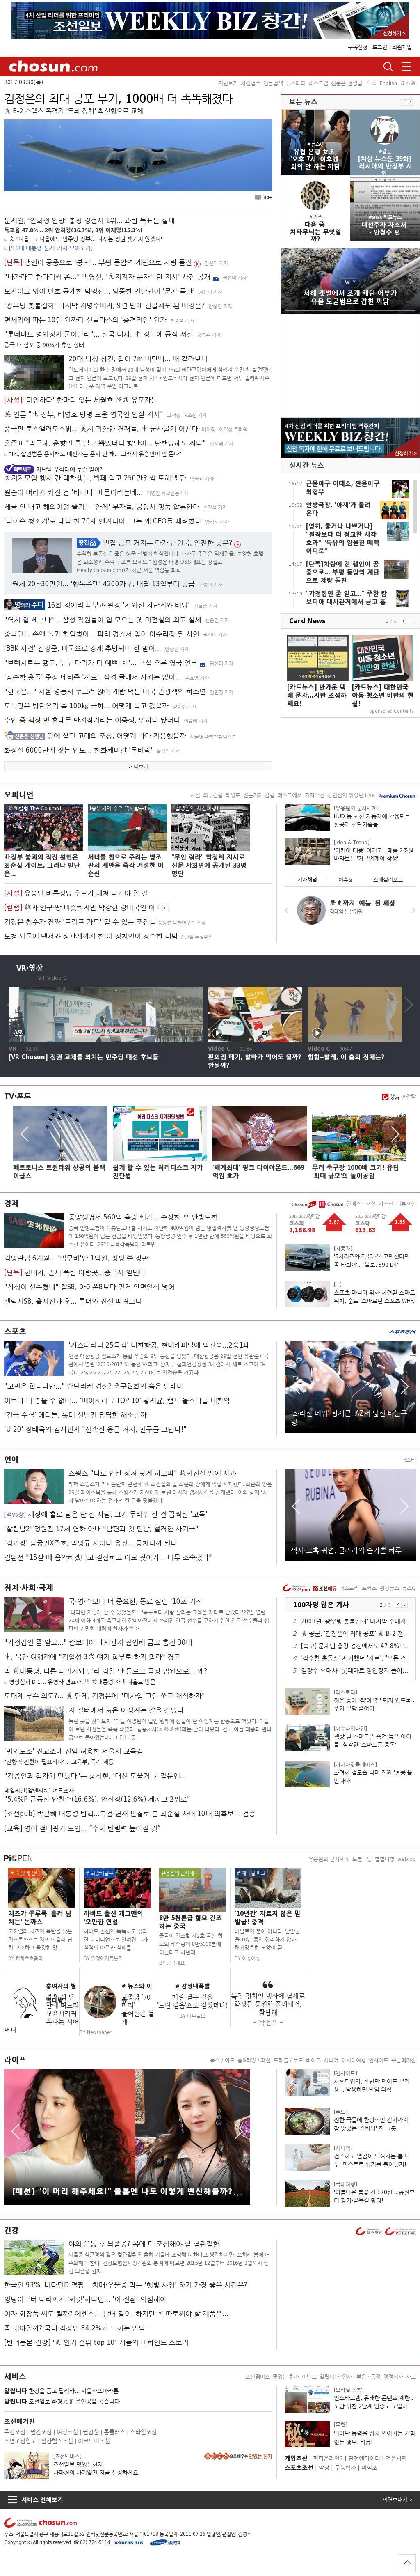 chosun.com at Wednesday March 29, 2017, 6:03 p.m. UTC